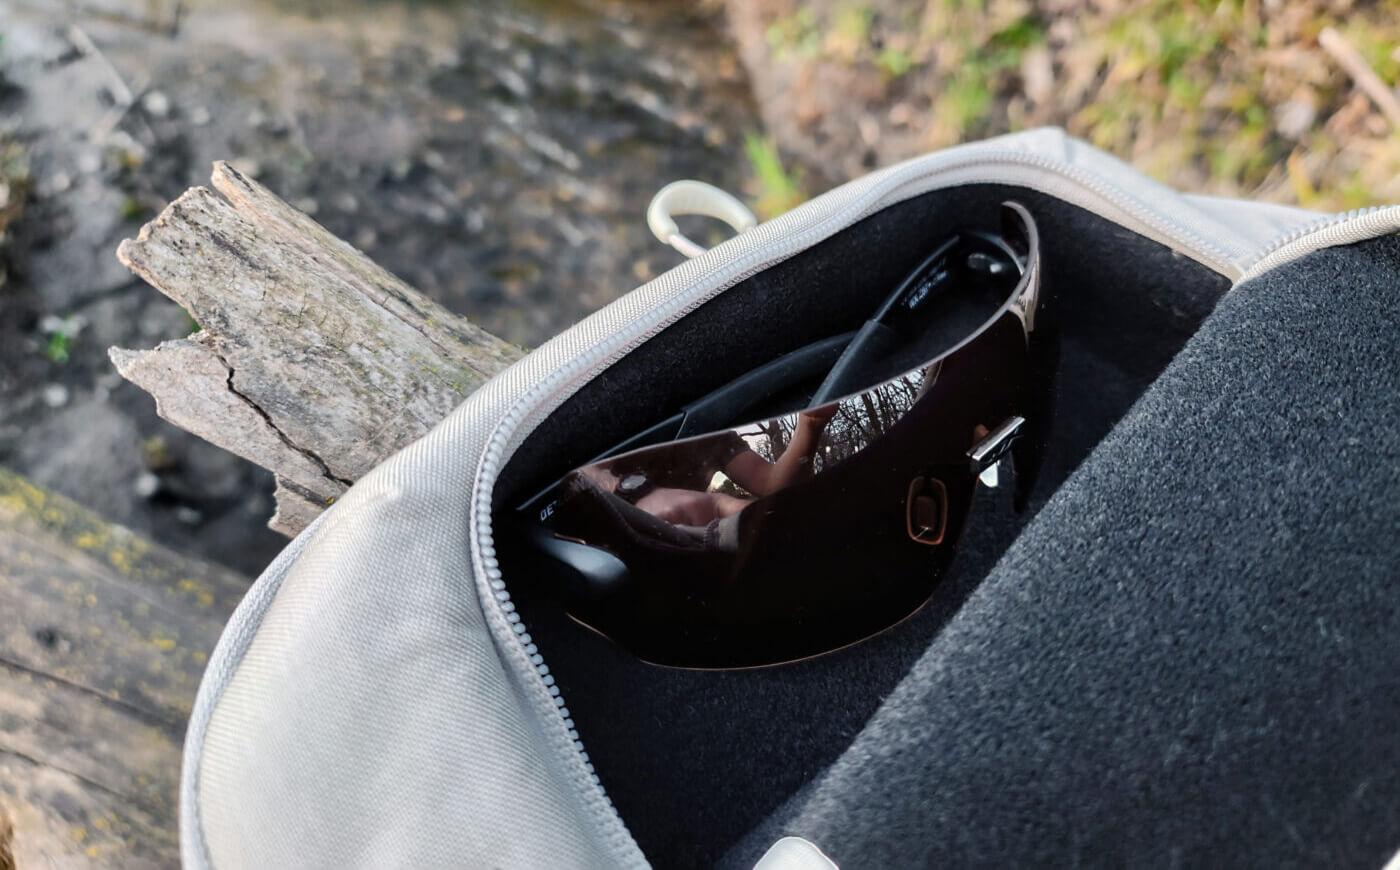 Glasses pocket in ALPS Ghost 30 backpack